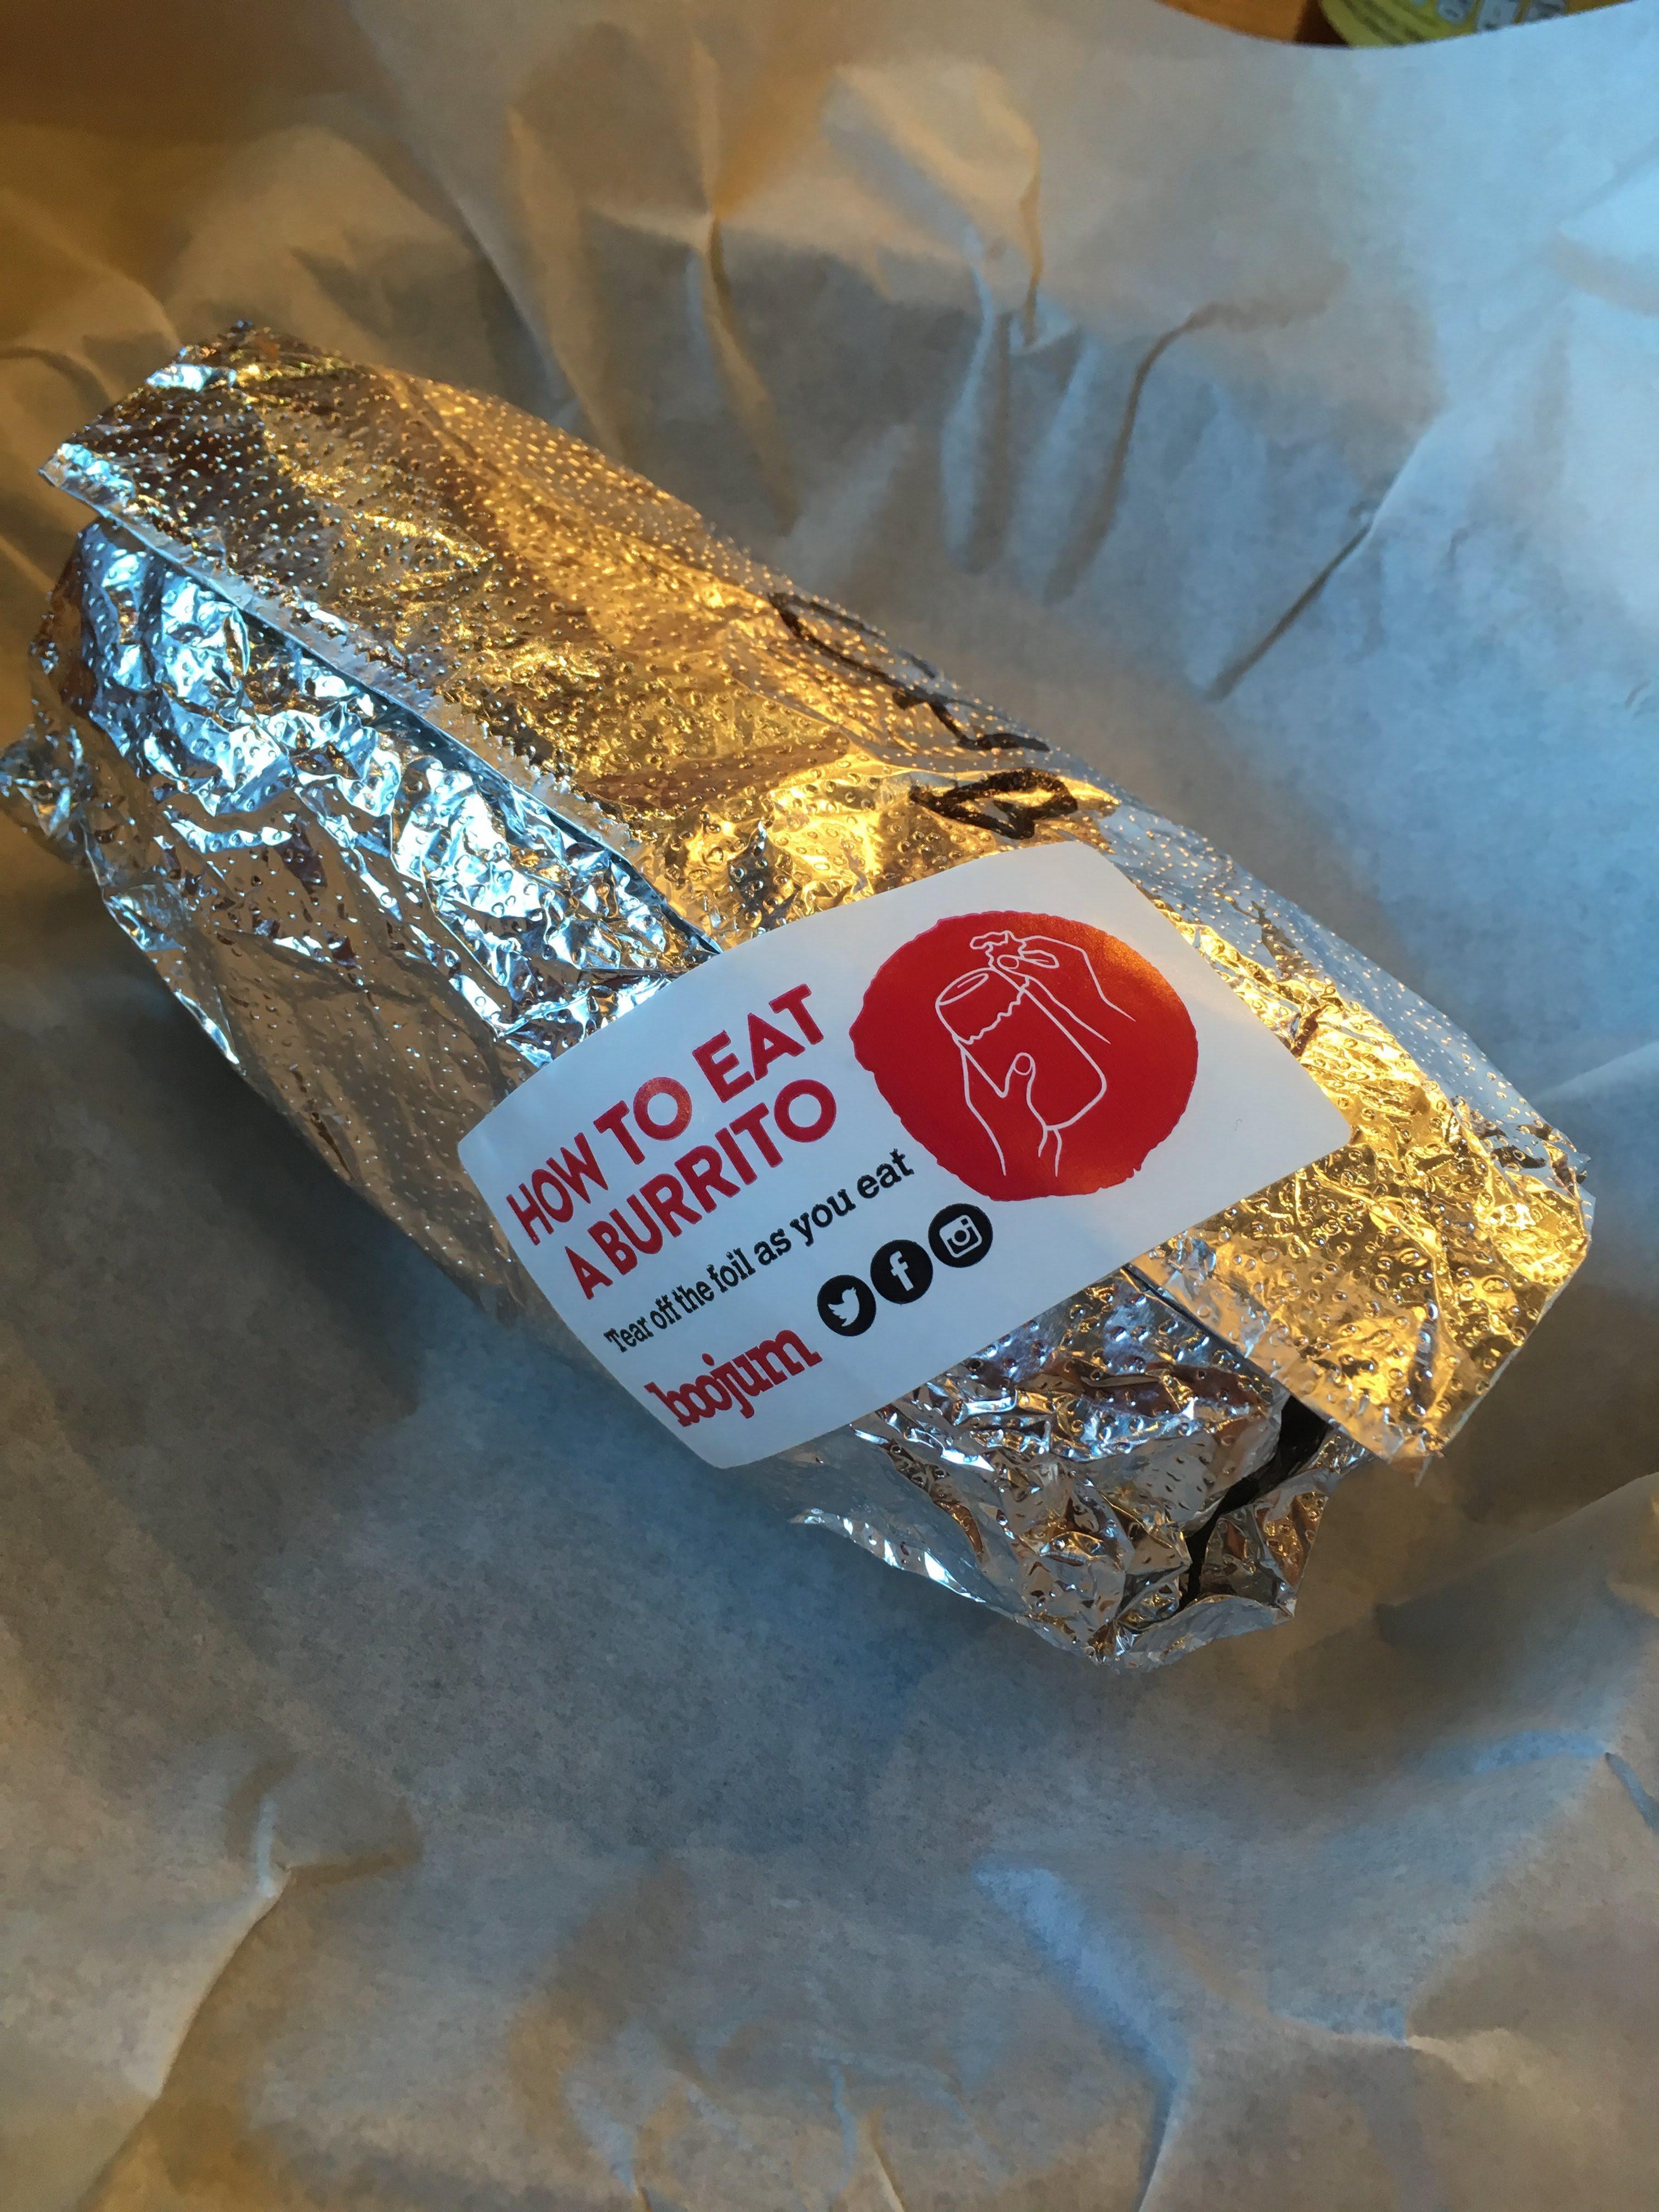 Mmm... Burrito